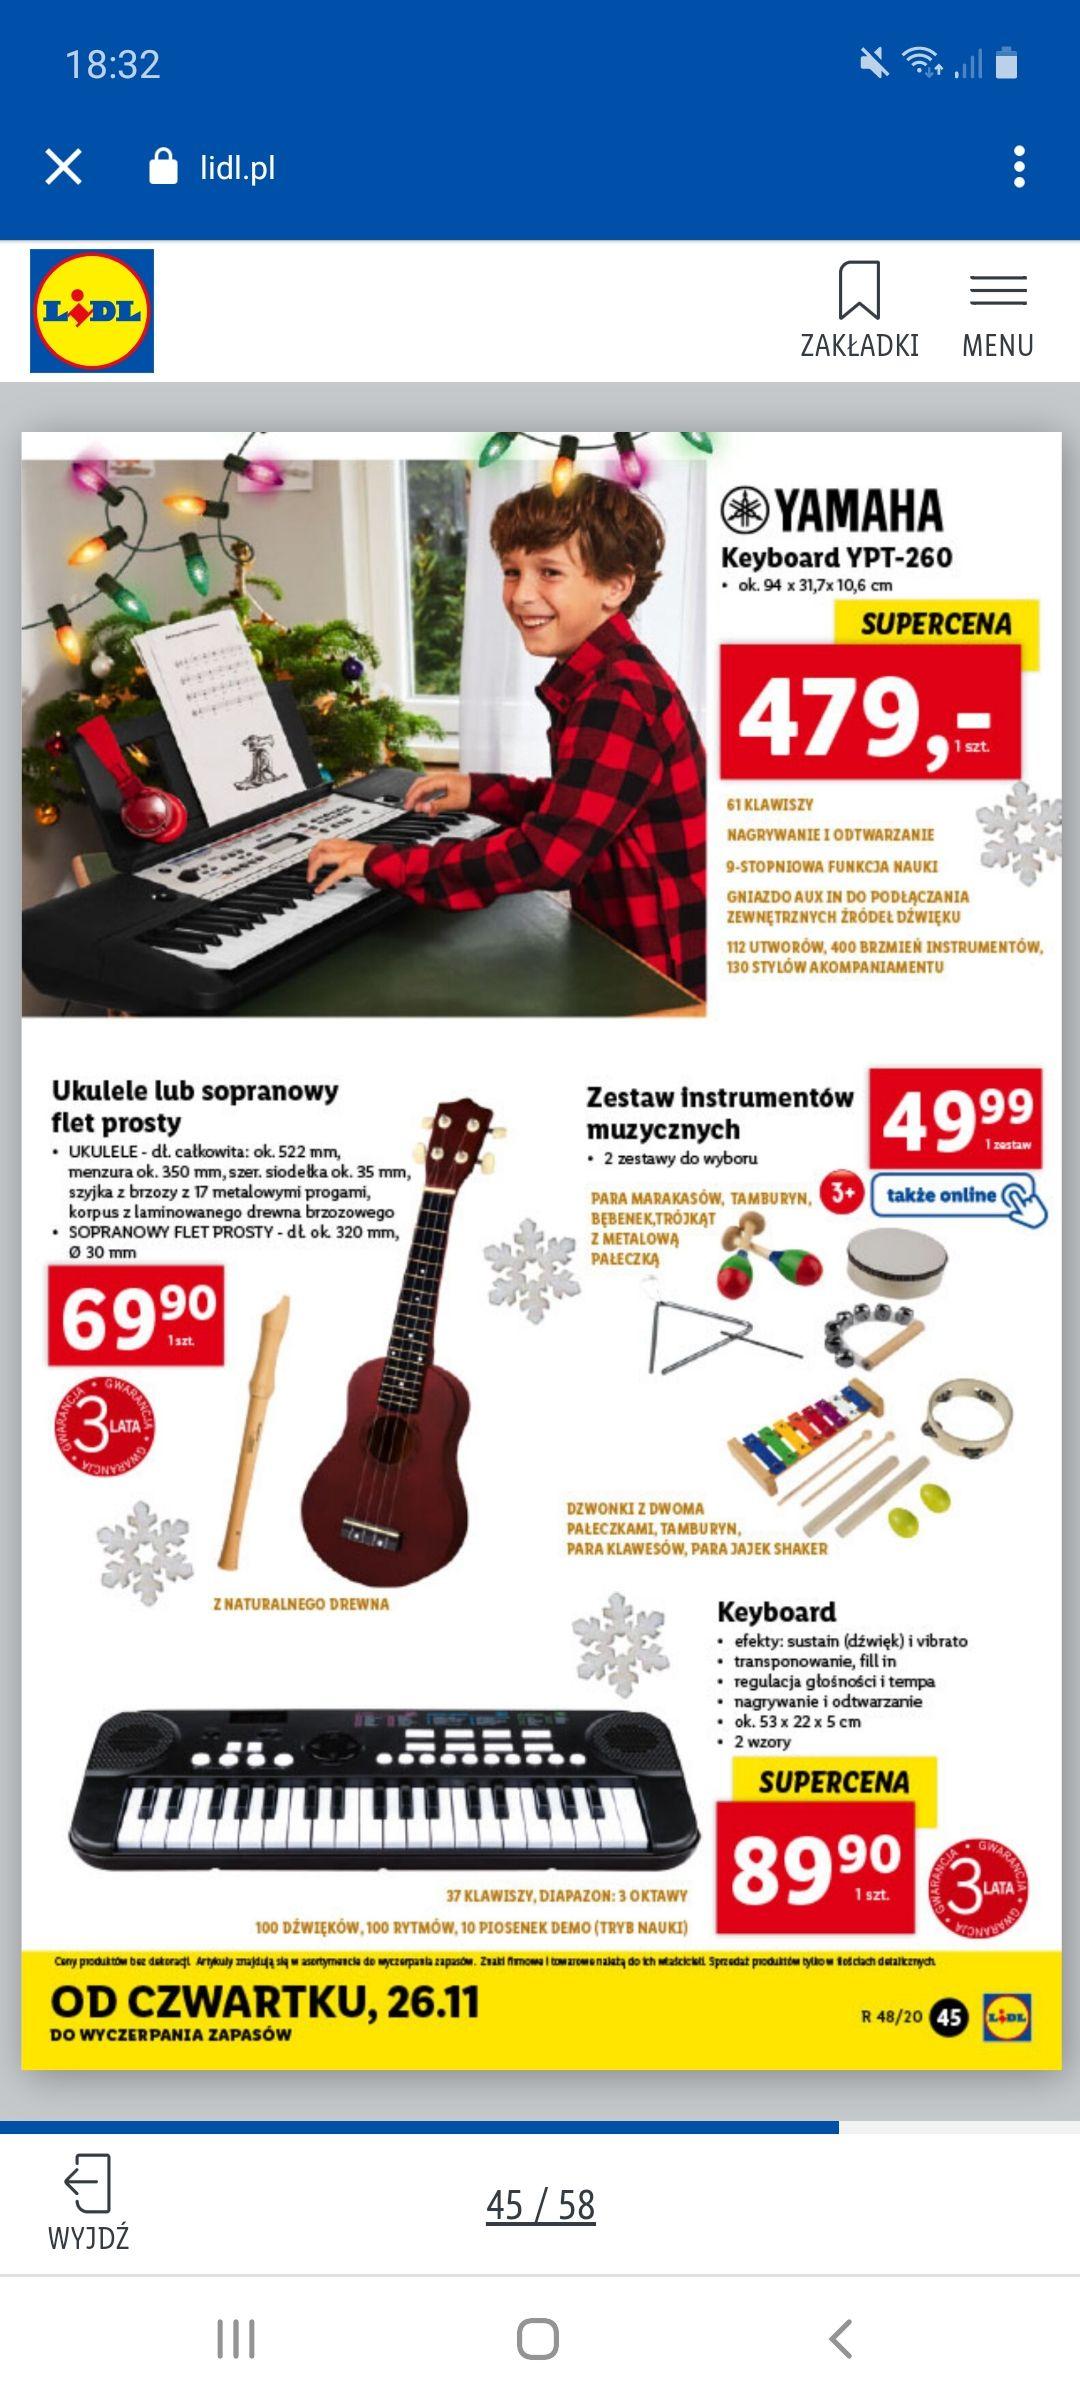 Keyboard Yamaha ypt-260 Lidl